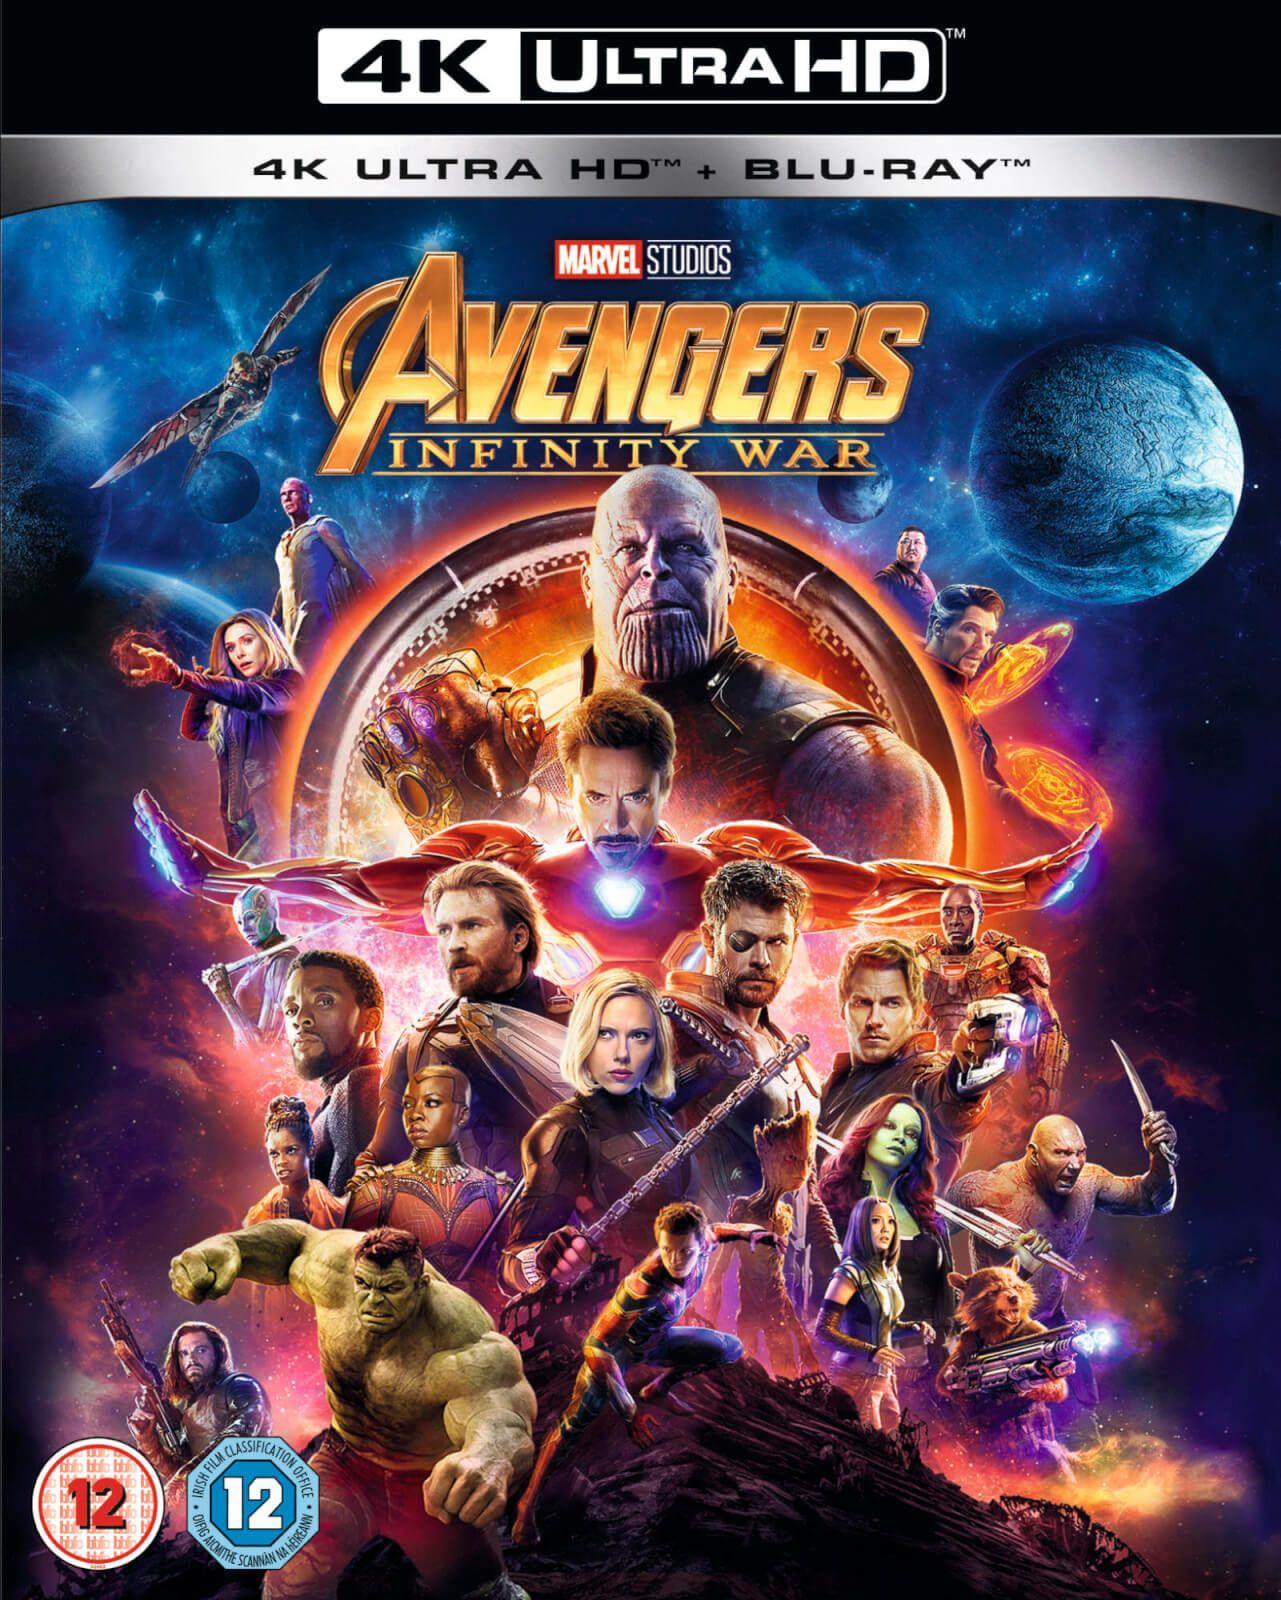 Avengers Infinity War 4K UHD + Blu-ray (preowned) £8 @ CeX